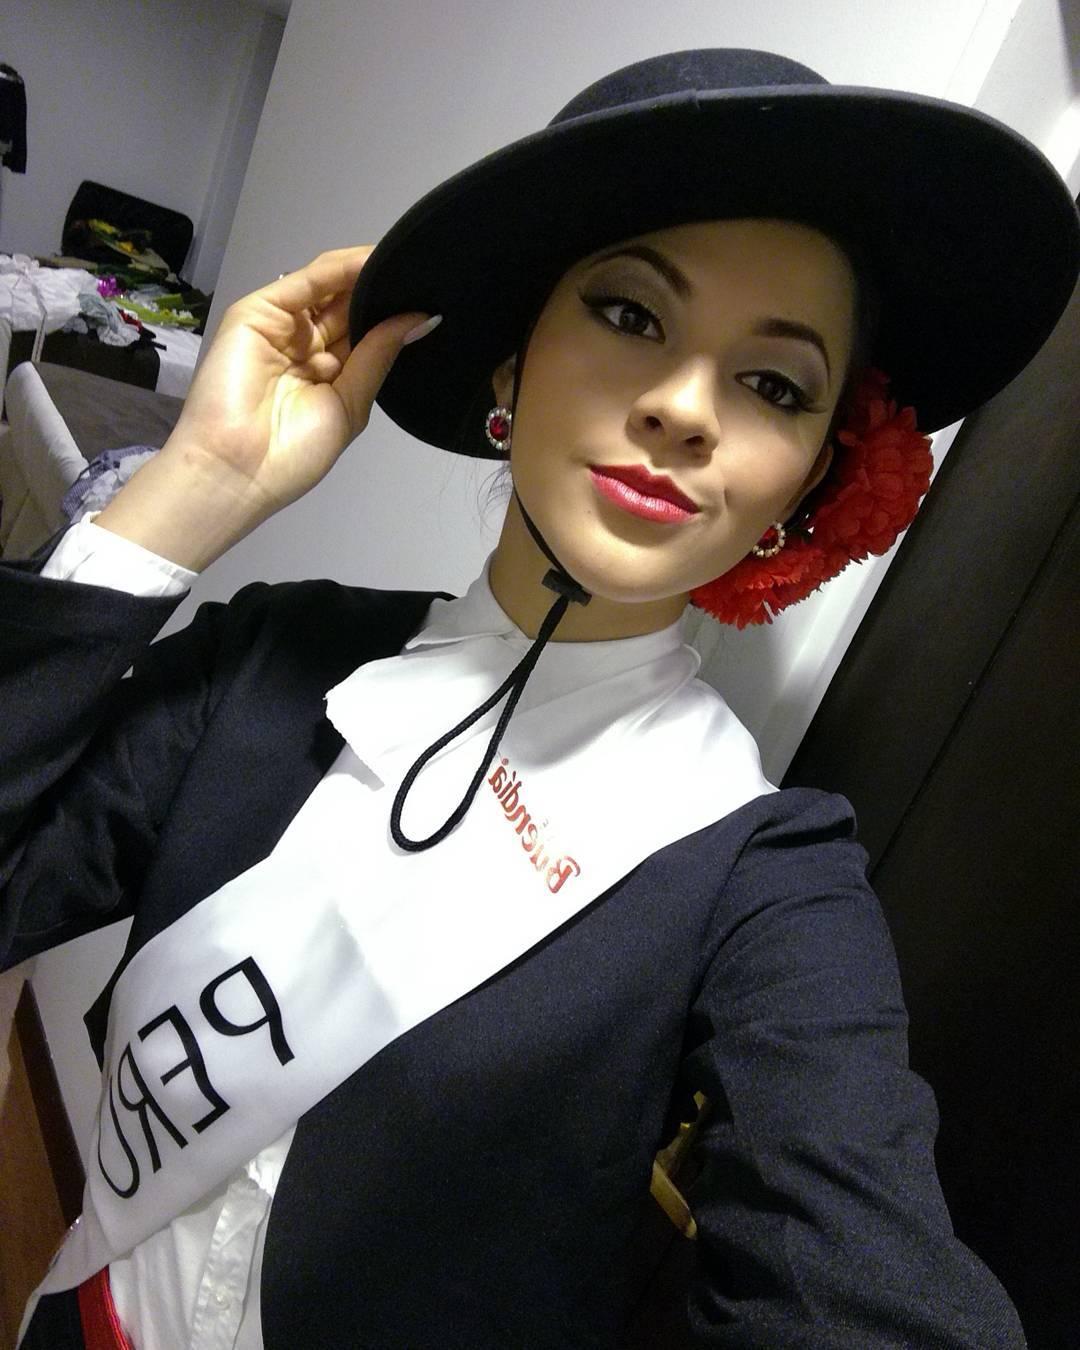 gabriela lambruschini, miss peru reyna internacional cafe 2018. - Página 4 26267510